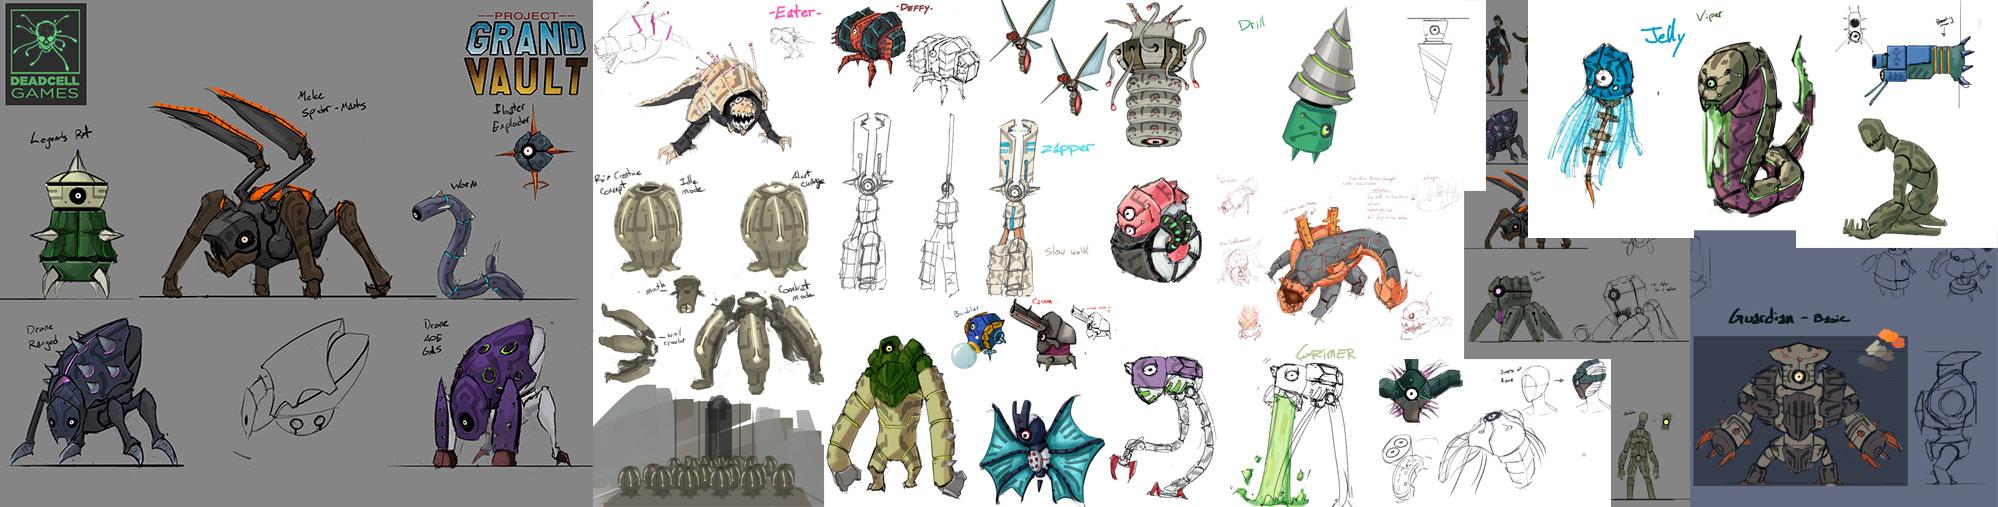 RuinCreatures collage